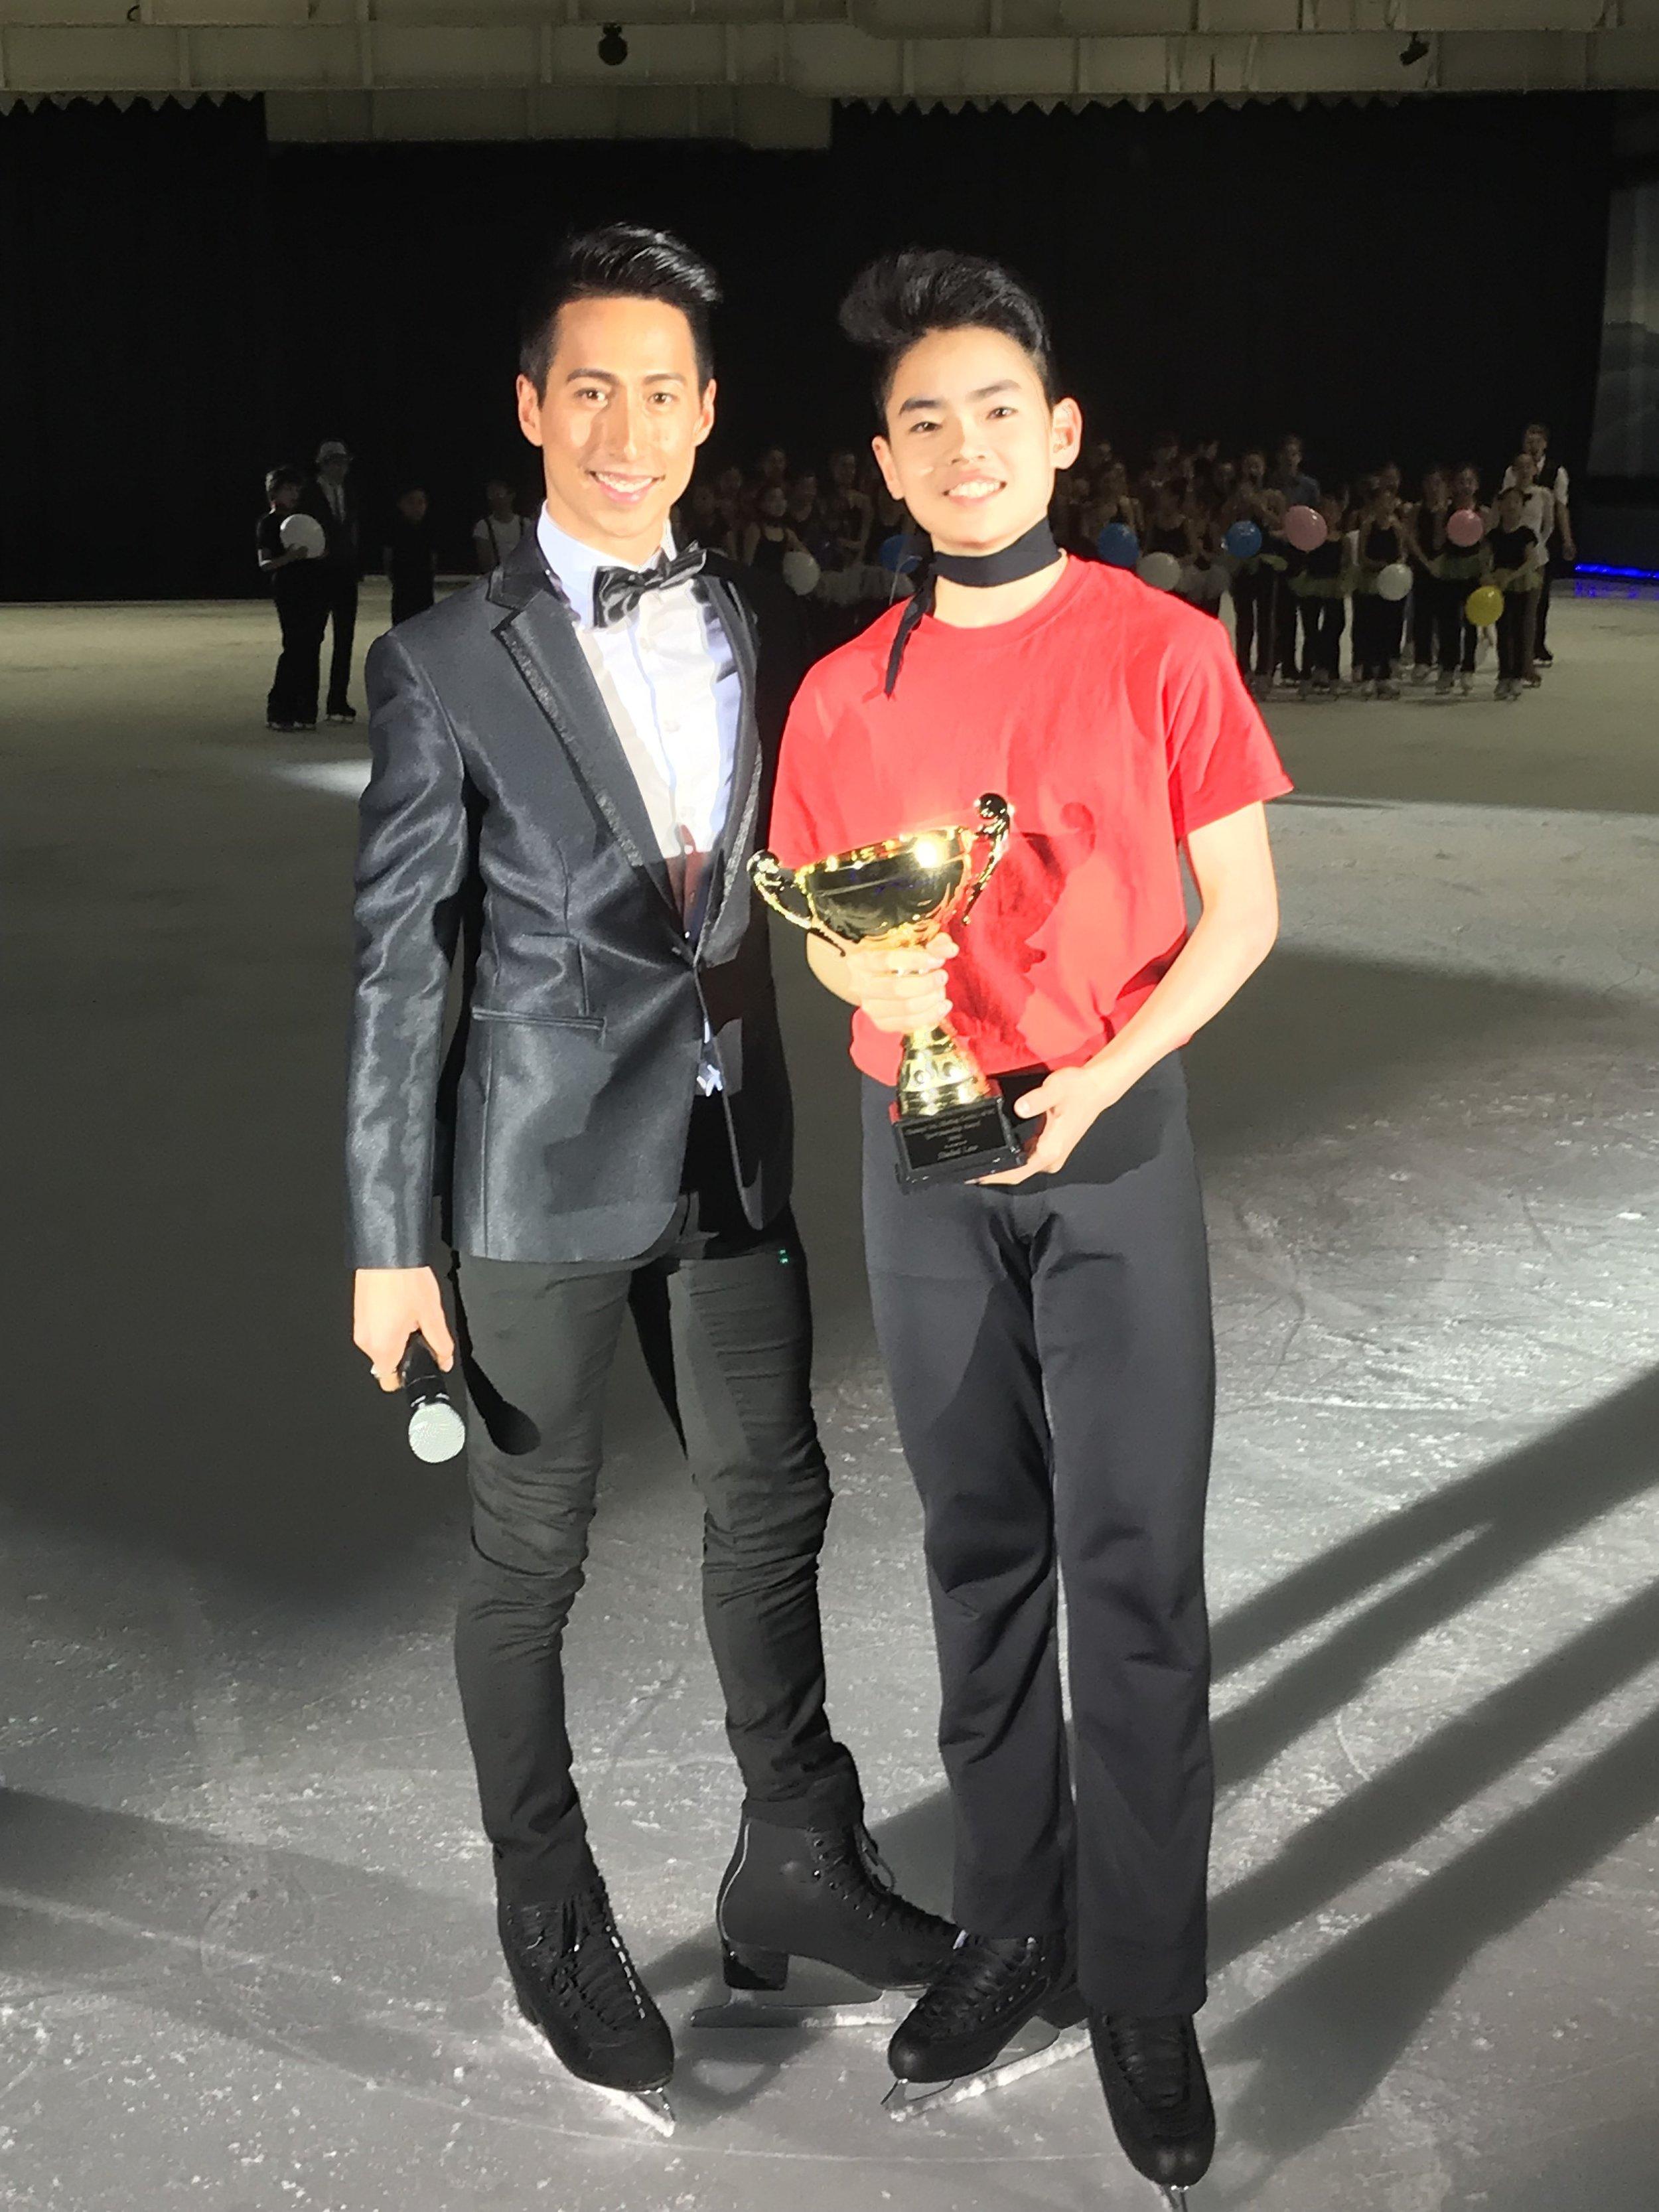 Shohei Law - 2019 Champs International Sportsmanship Award